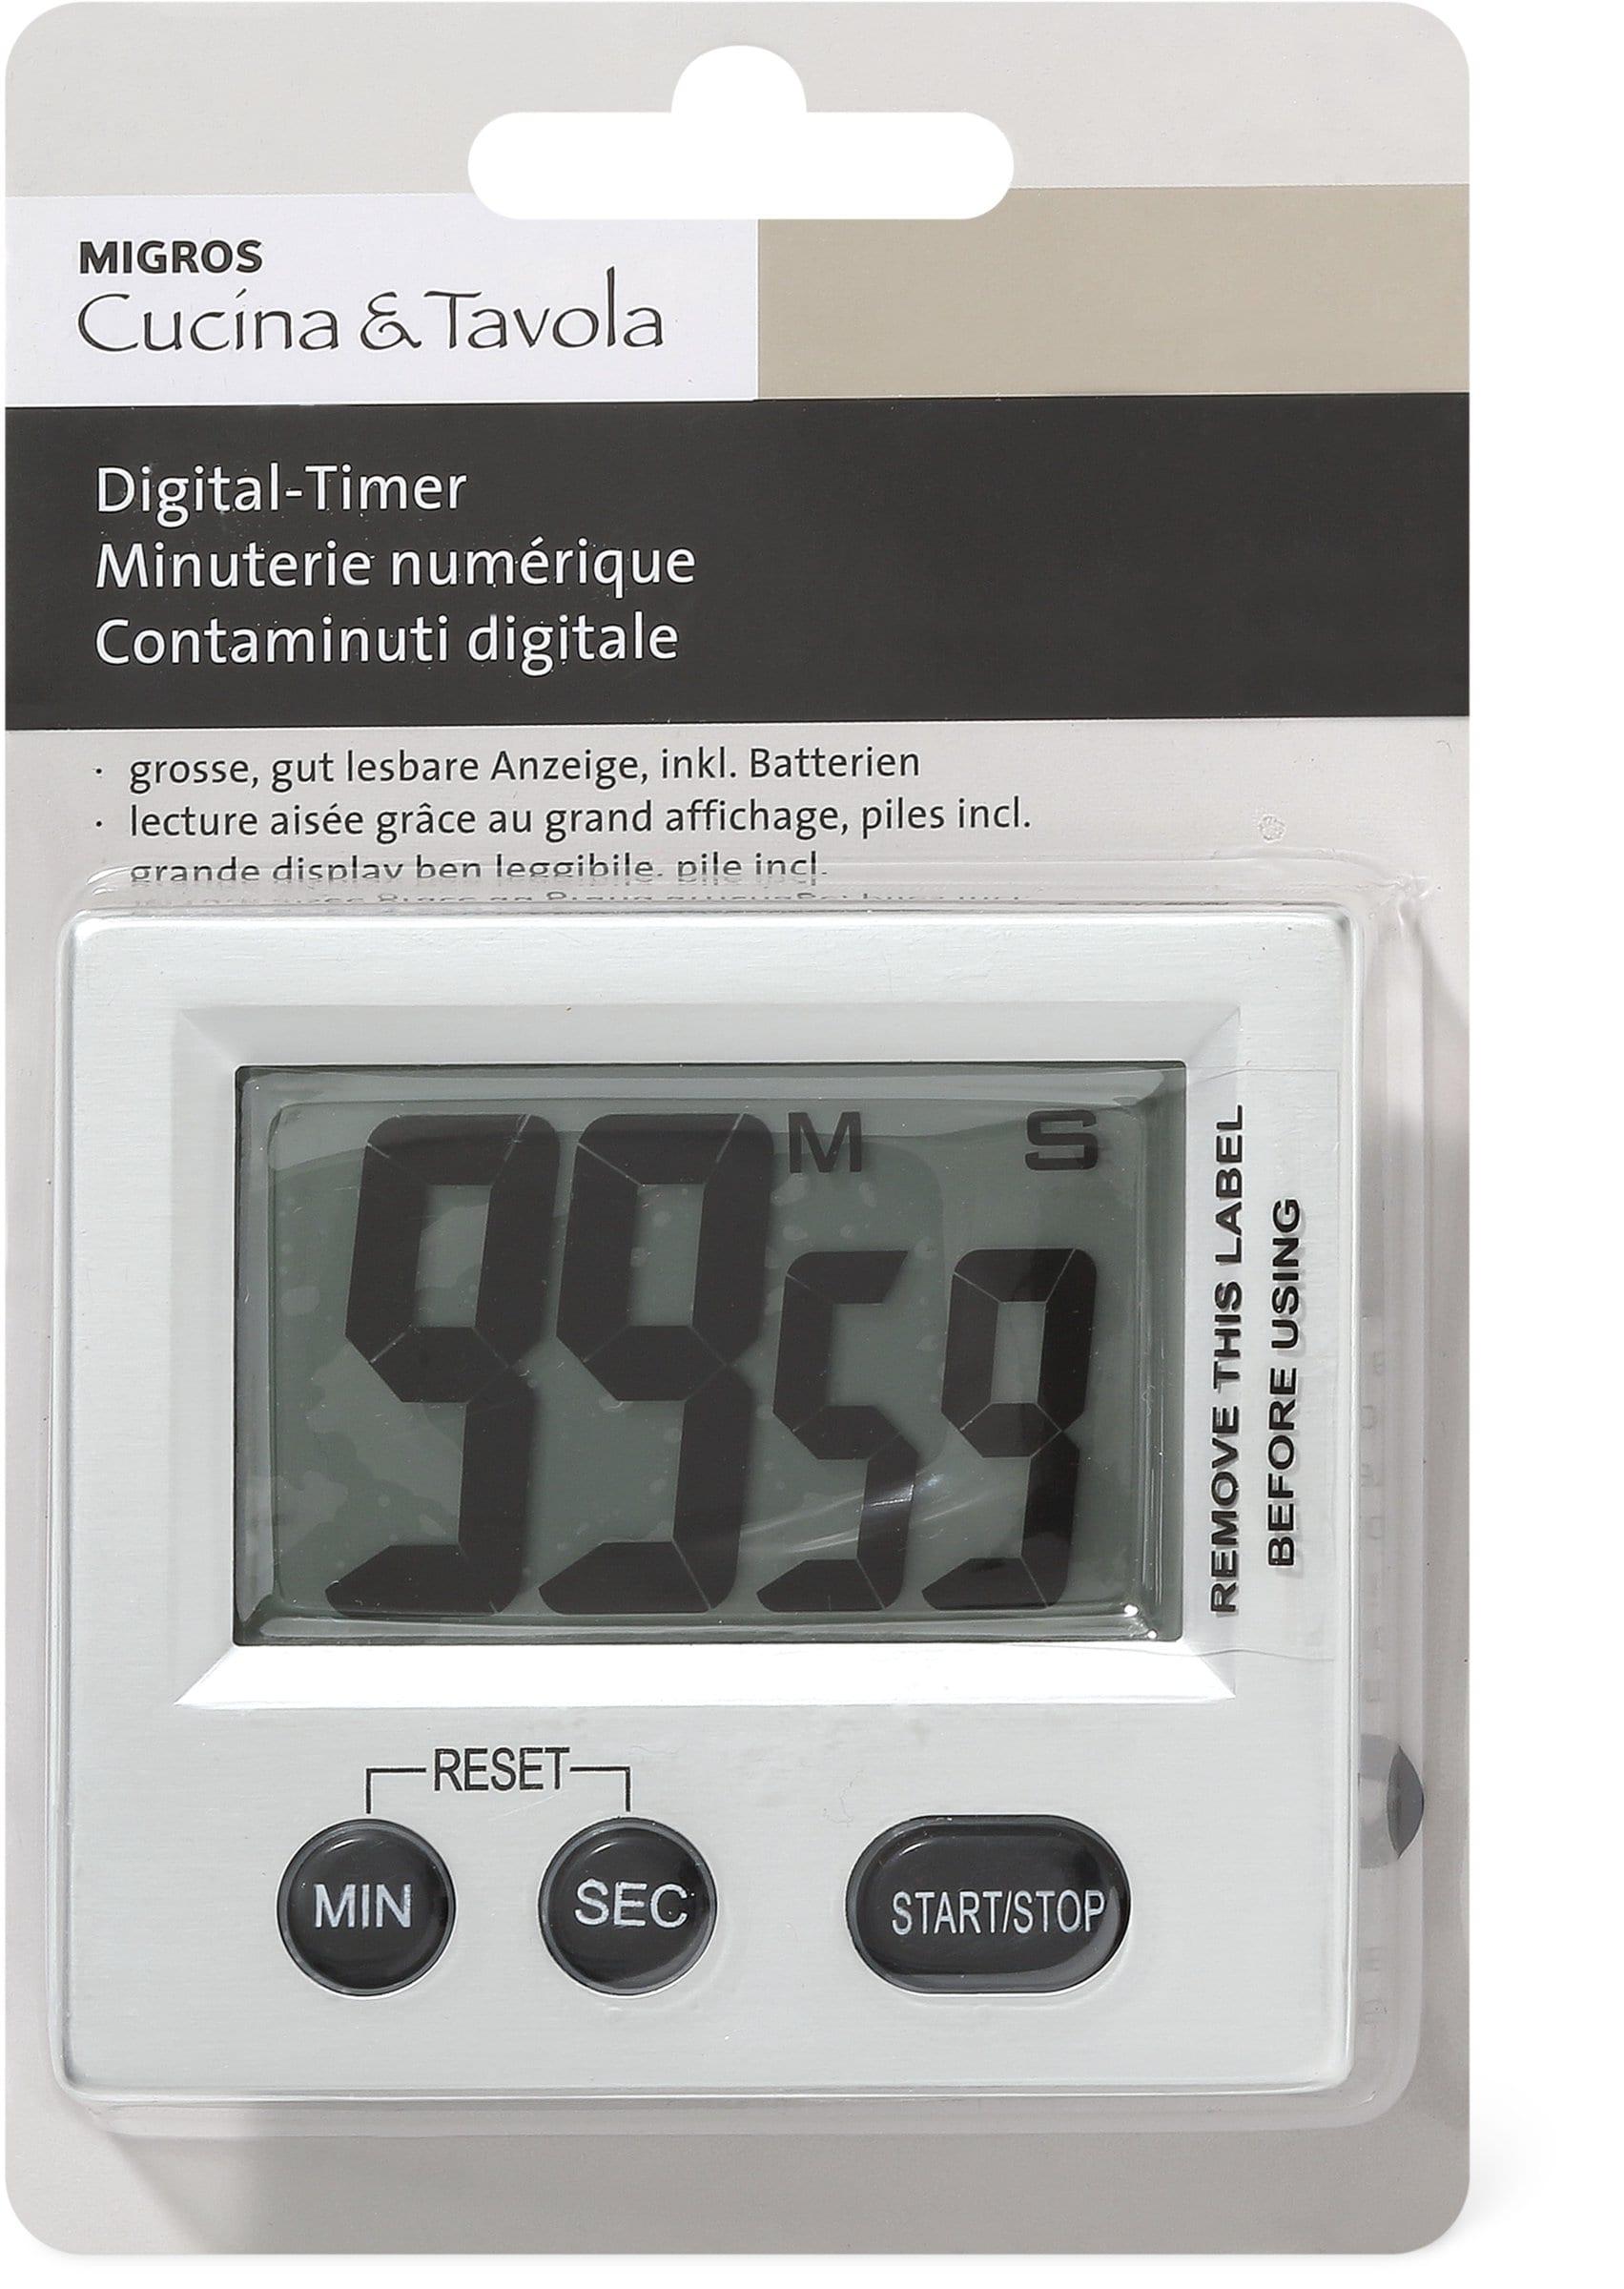 Cucina & Tavola Contaminuti digitale